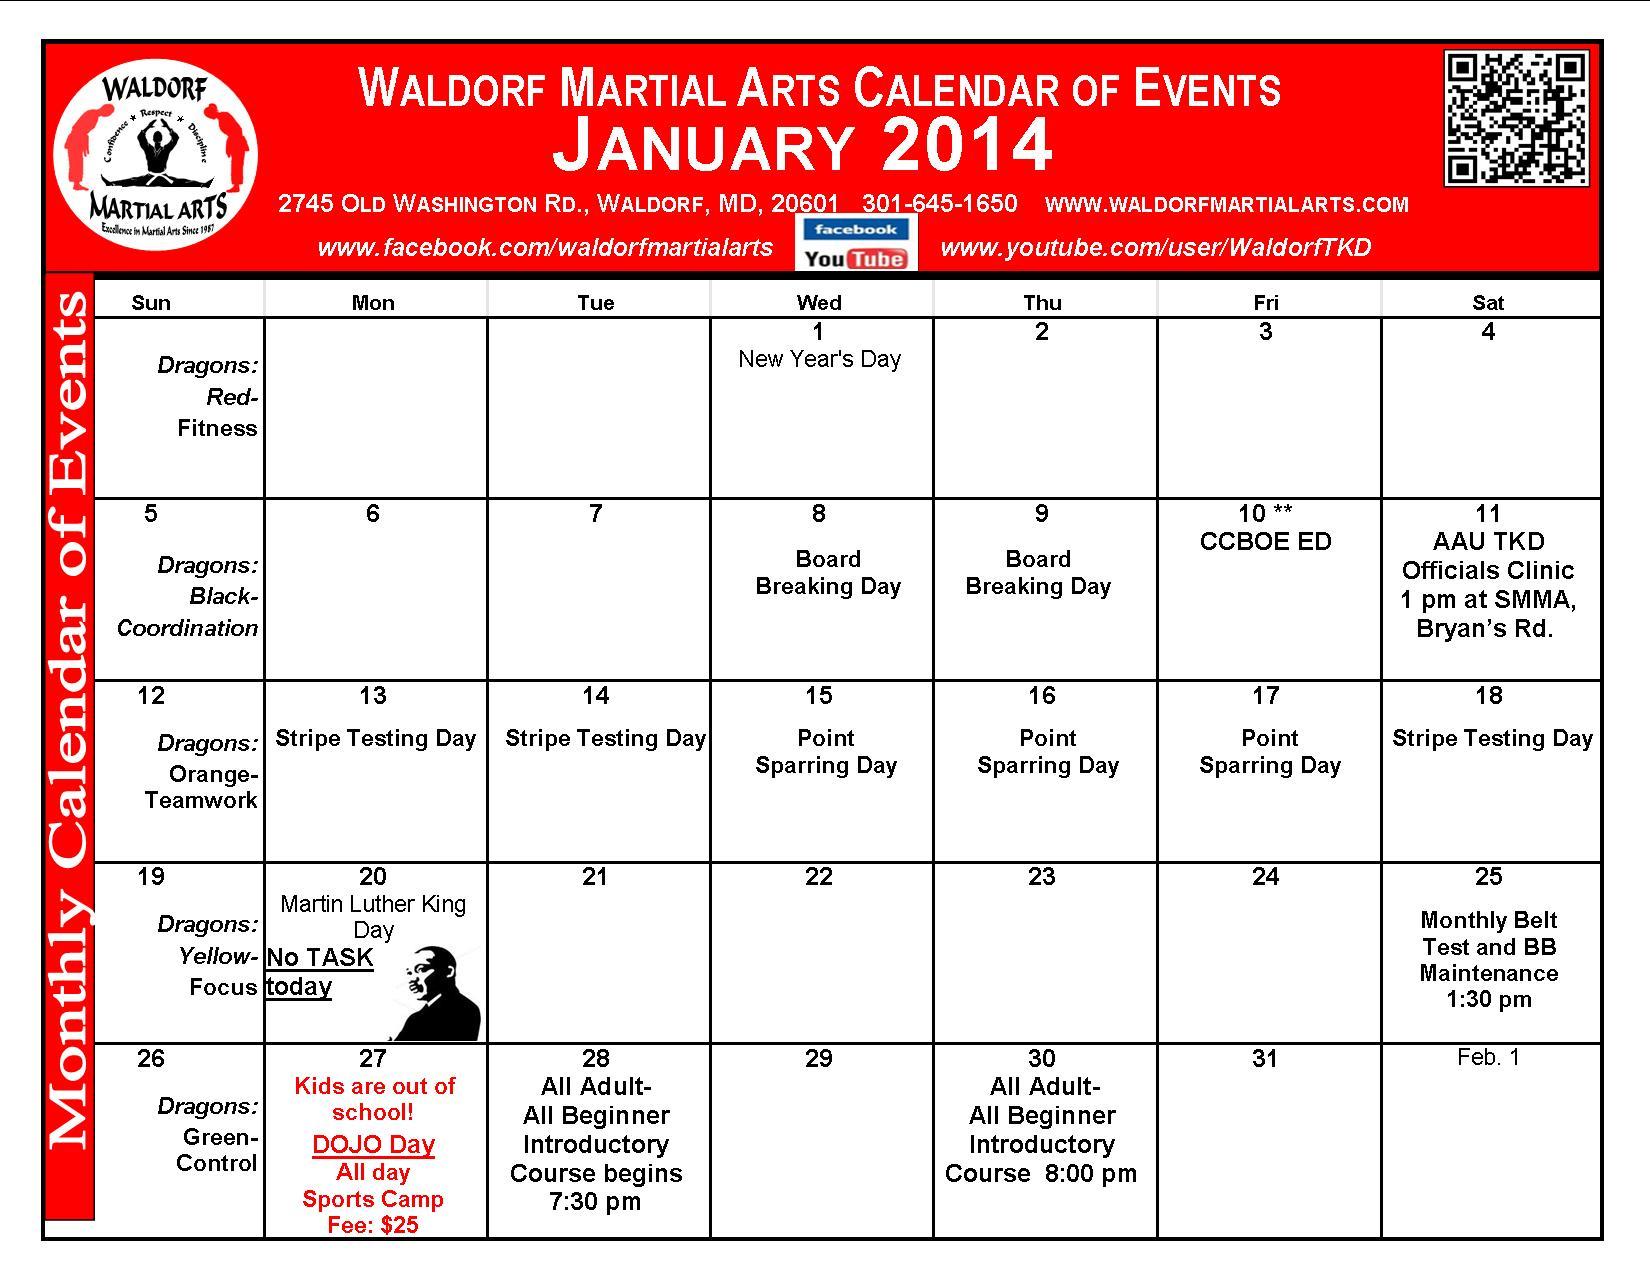 Waldorf Martial Arts January Calendar Of Events